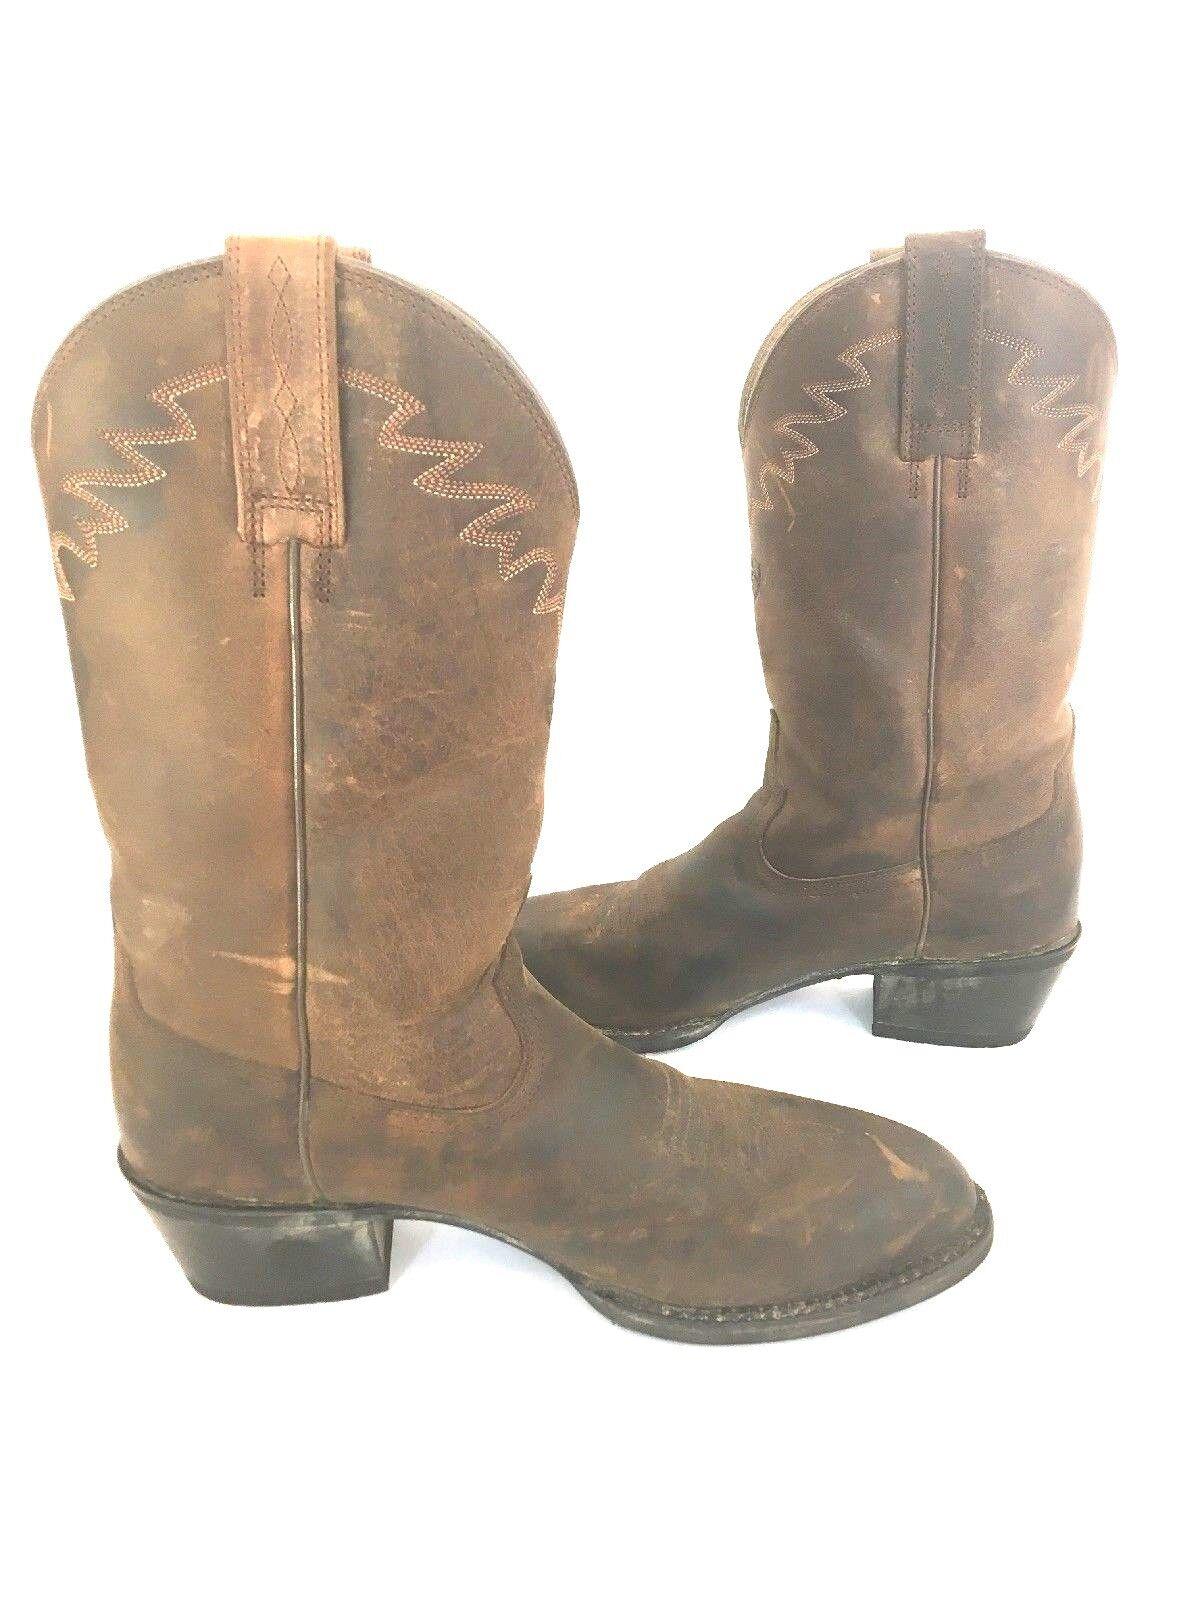 Ariat 4LR Uomo Sedona Brown Leather Cowboy Boots Distressed 10002194 Uomo 4LR Size 8 D e5c773